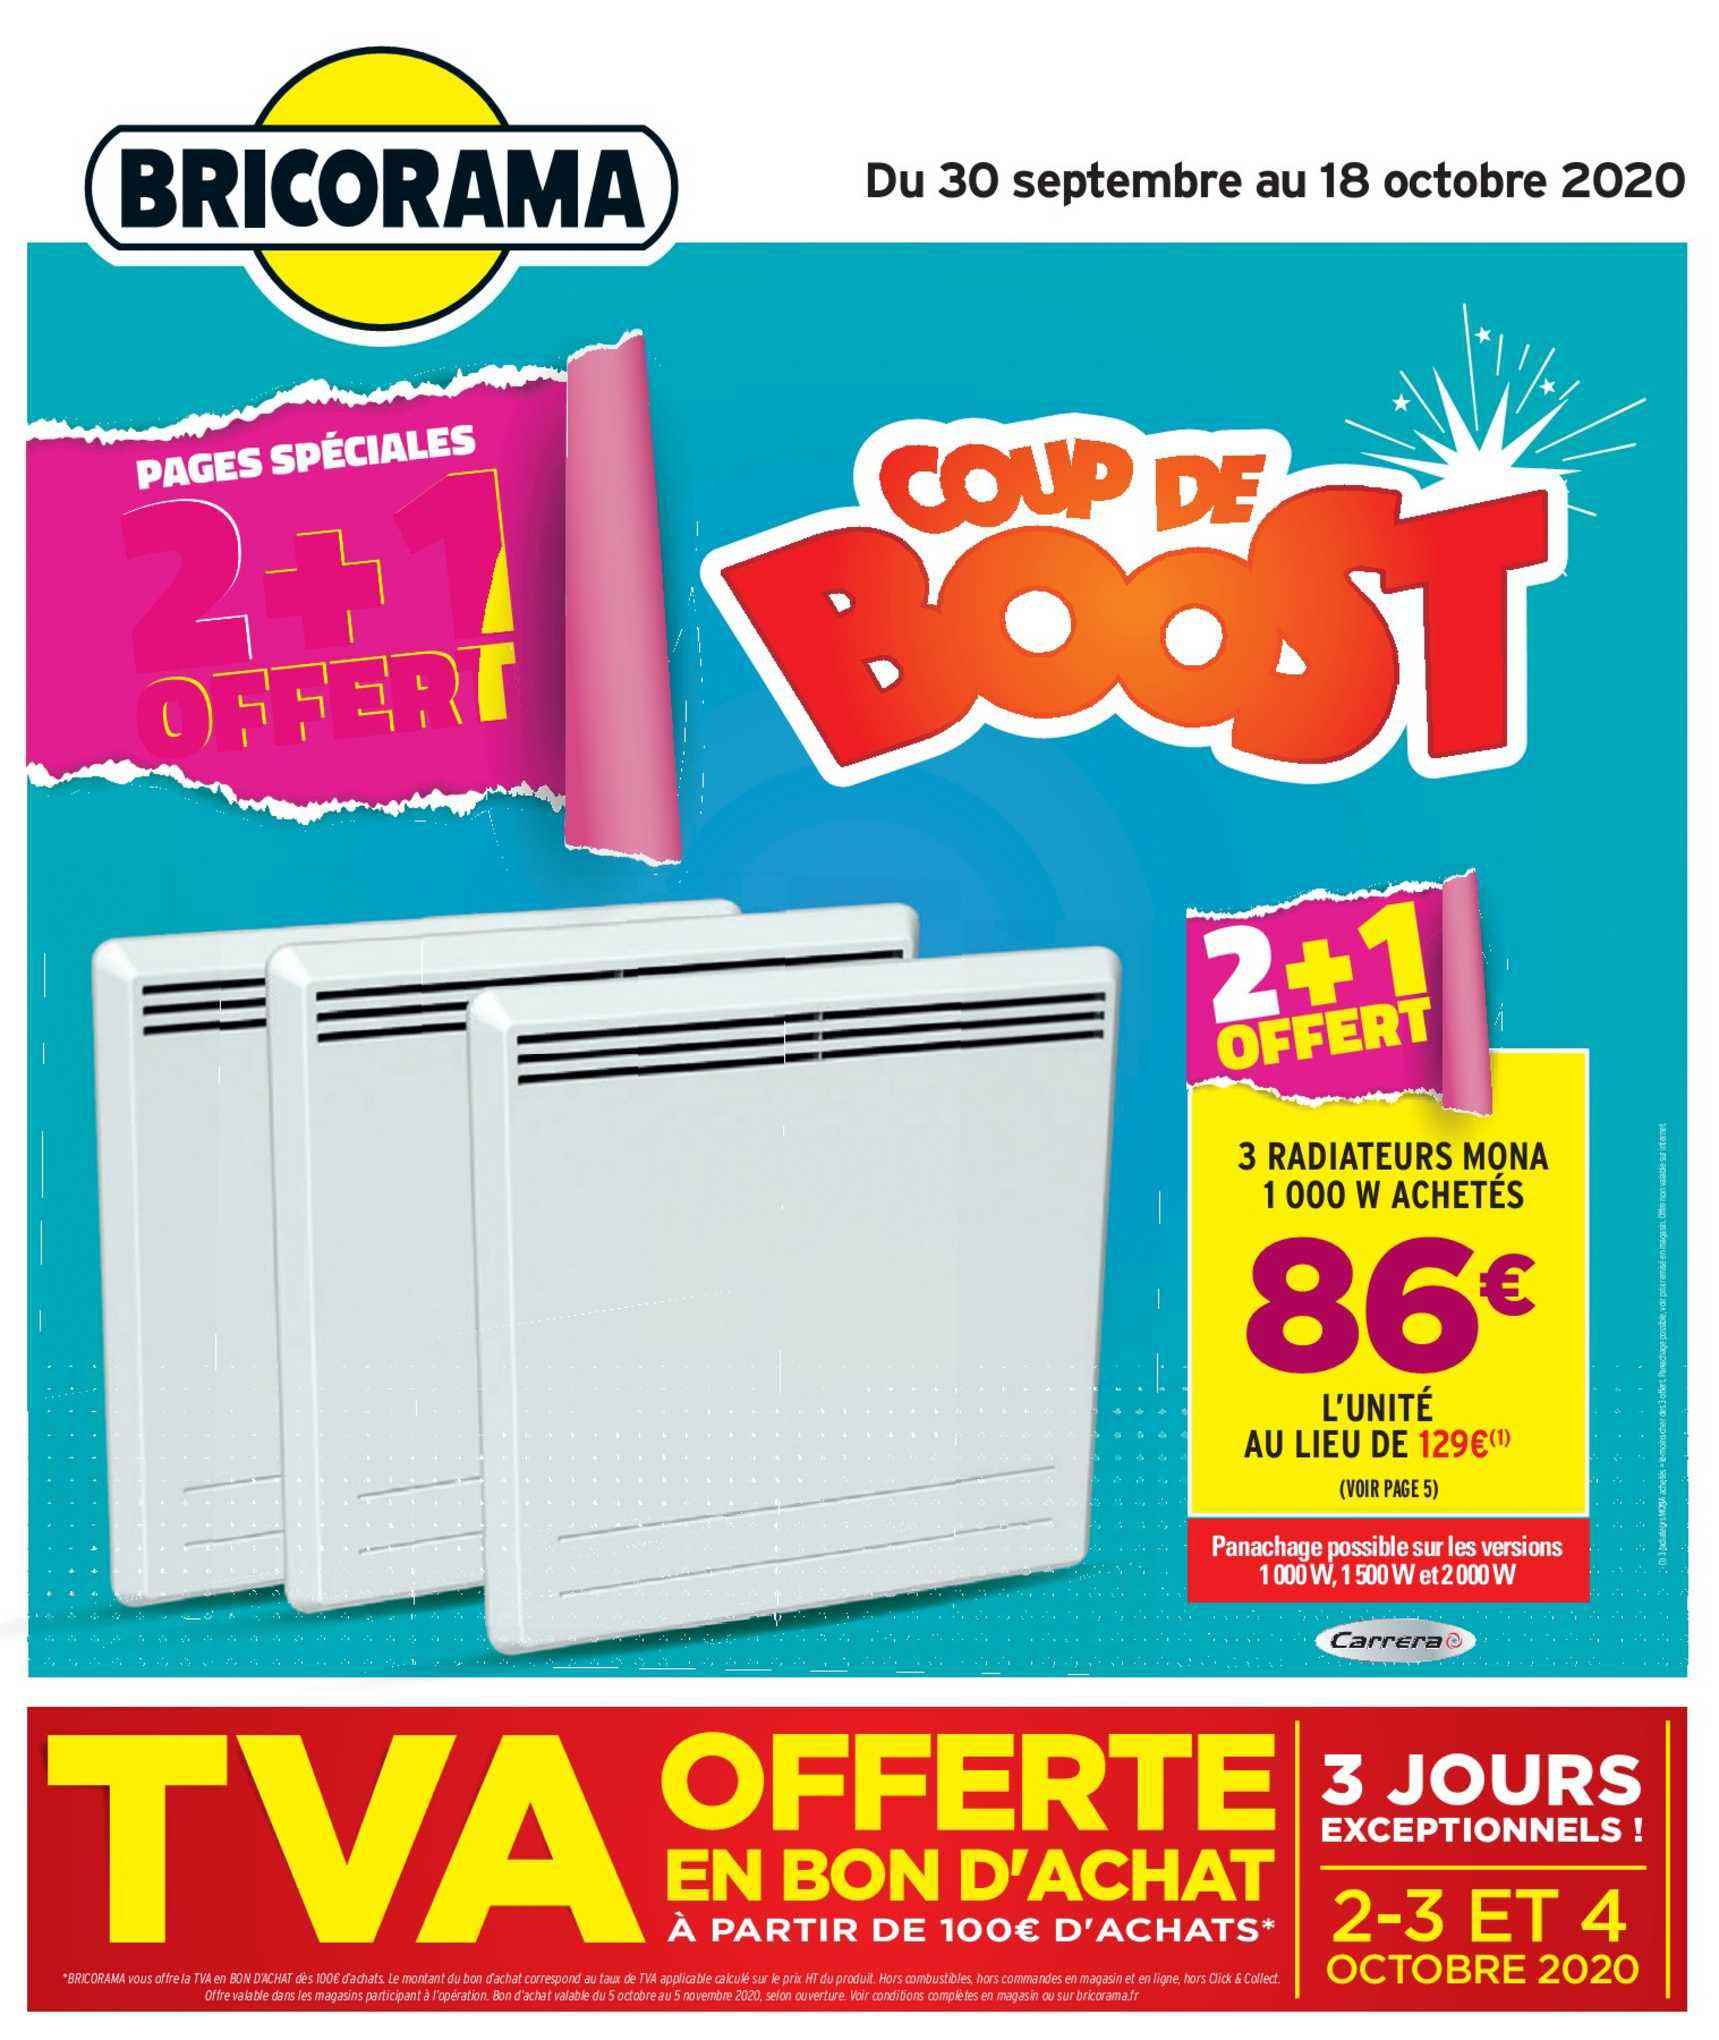 Bricorama 3 Radiateurs Mona 2+1 Offert